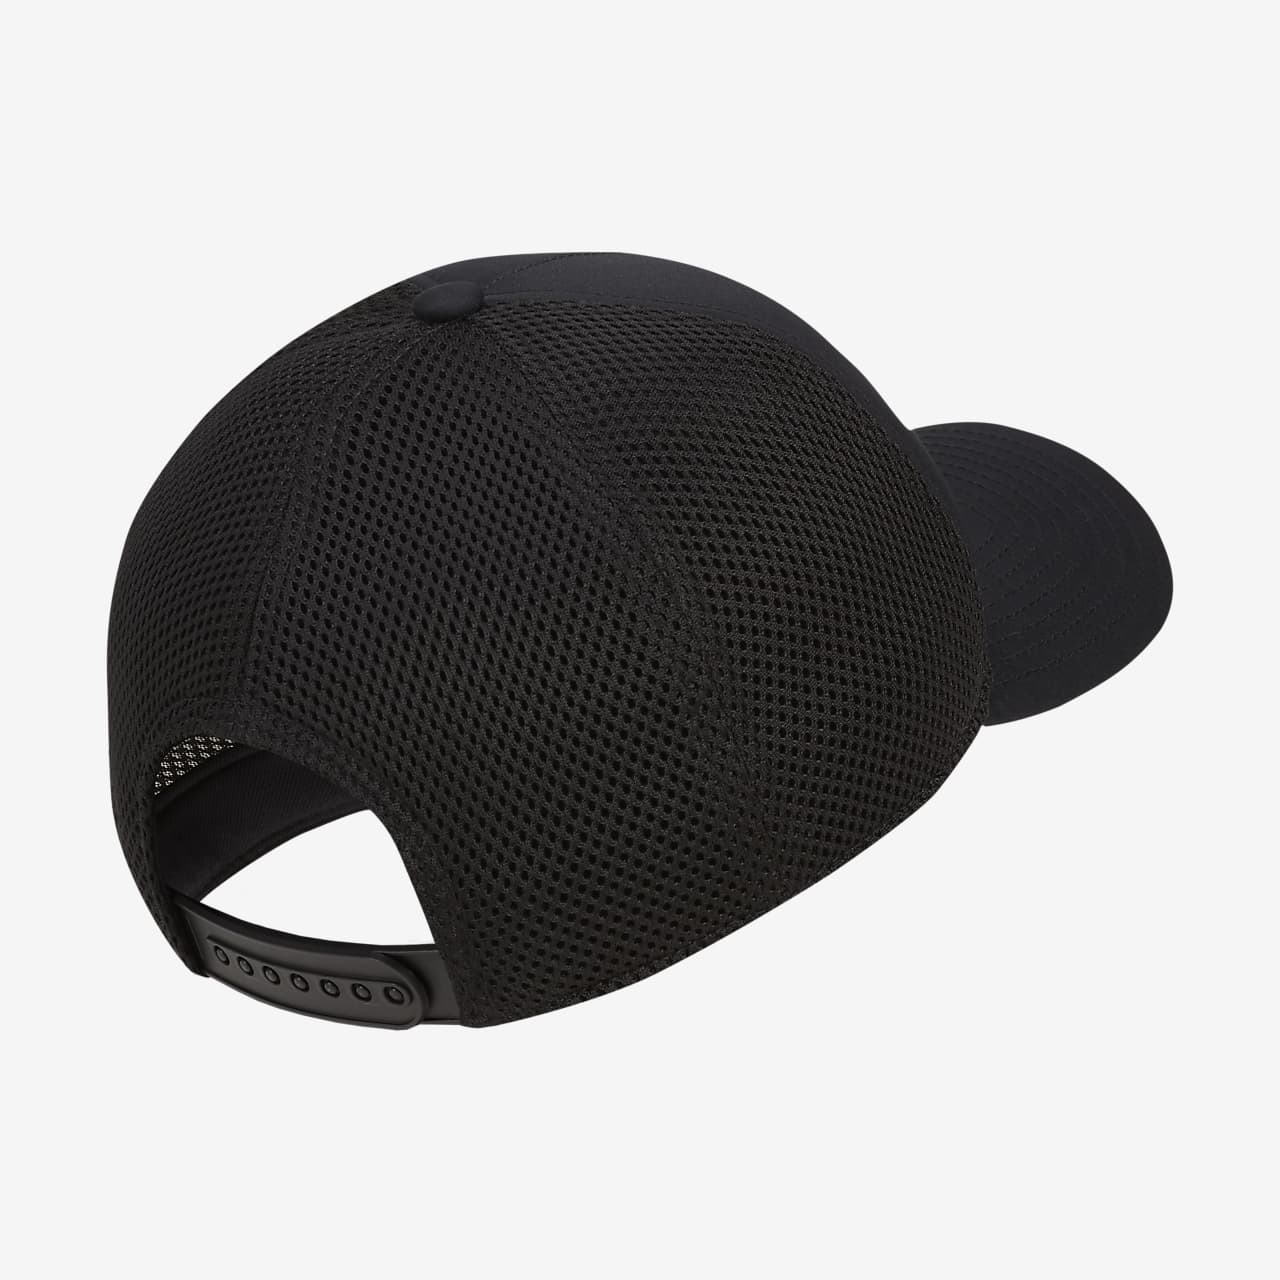 Nike Air Classic 99 Adjustable Cap DA2018-010